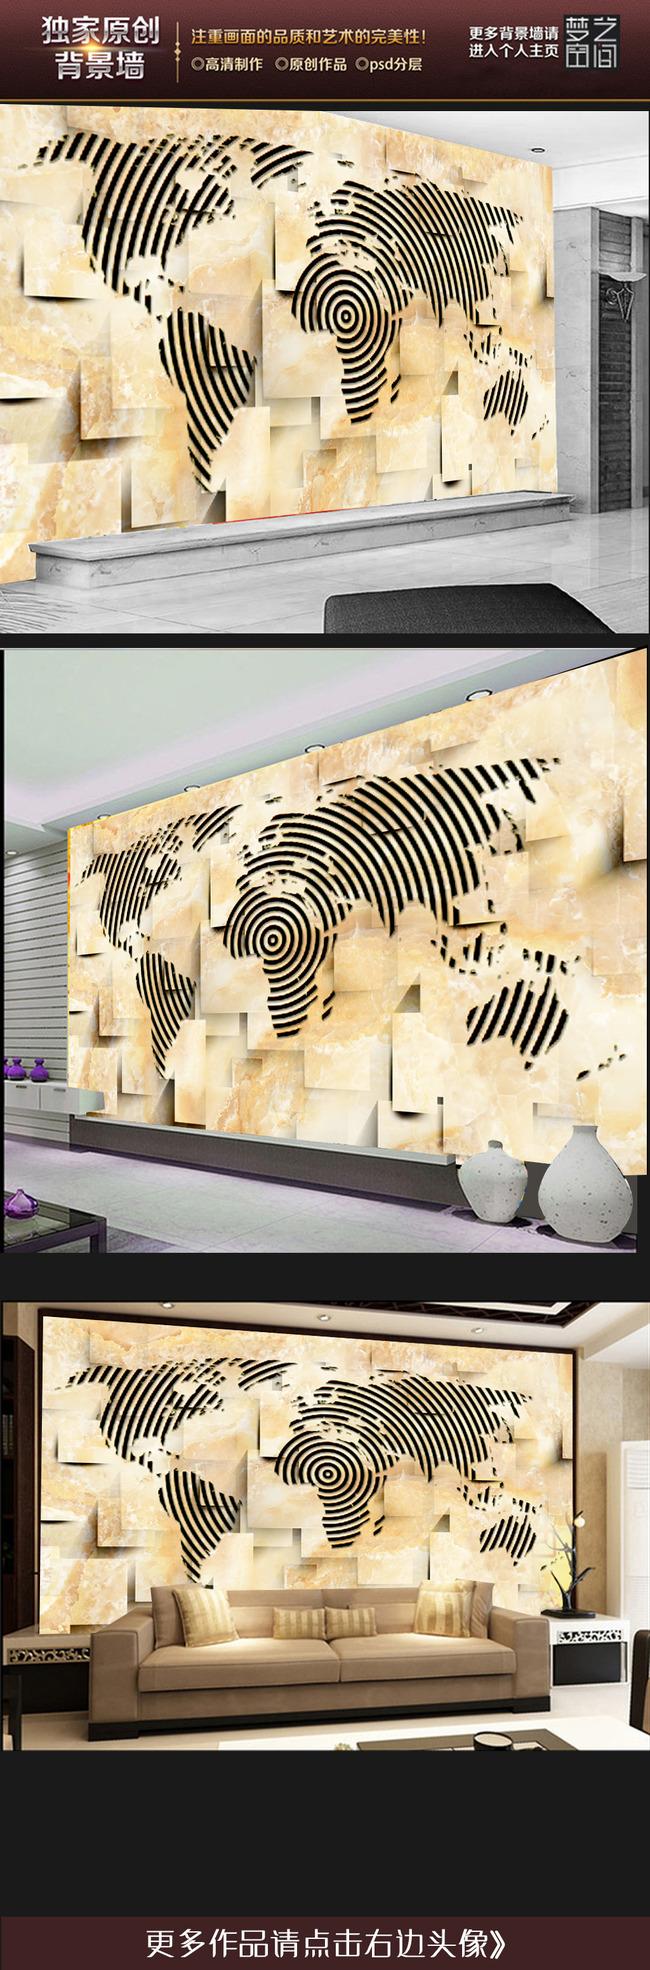 3d立体壁画世界地图大理石电视背景墙高清图片下载()